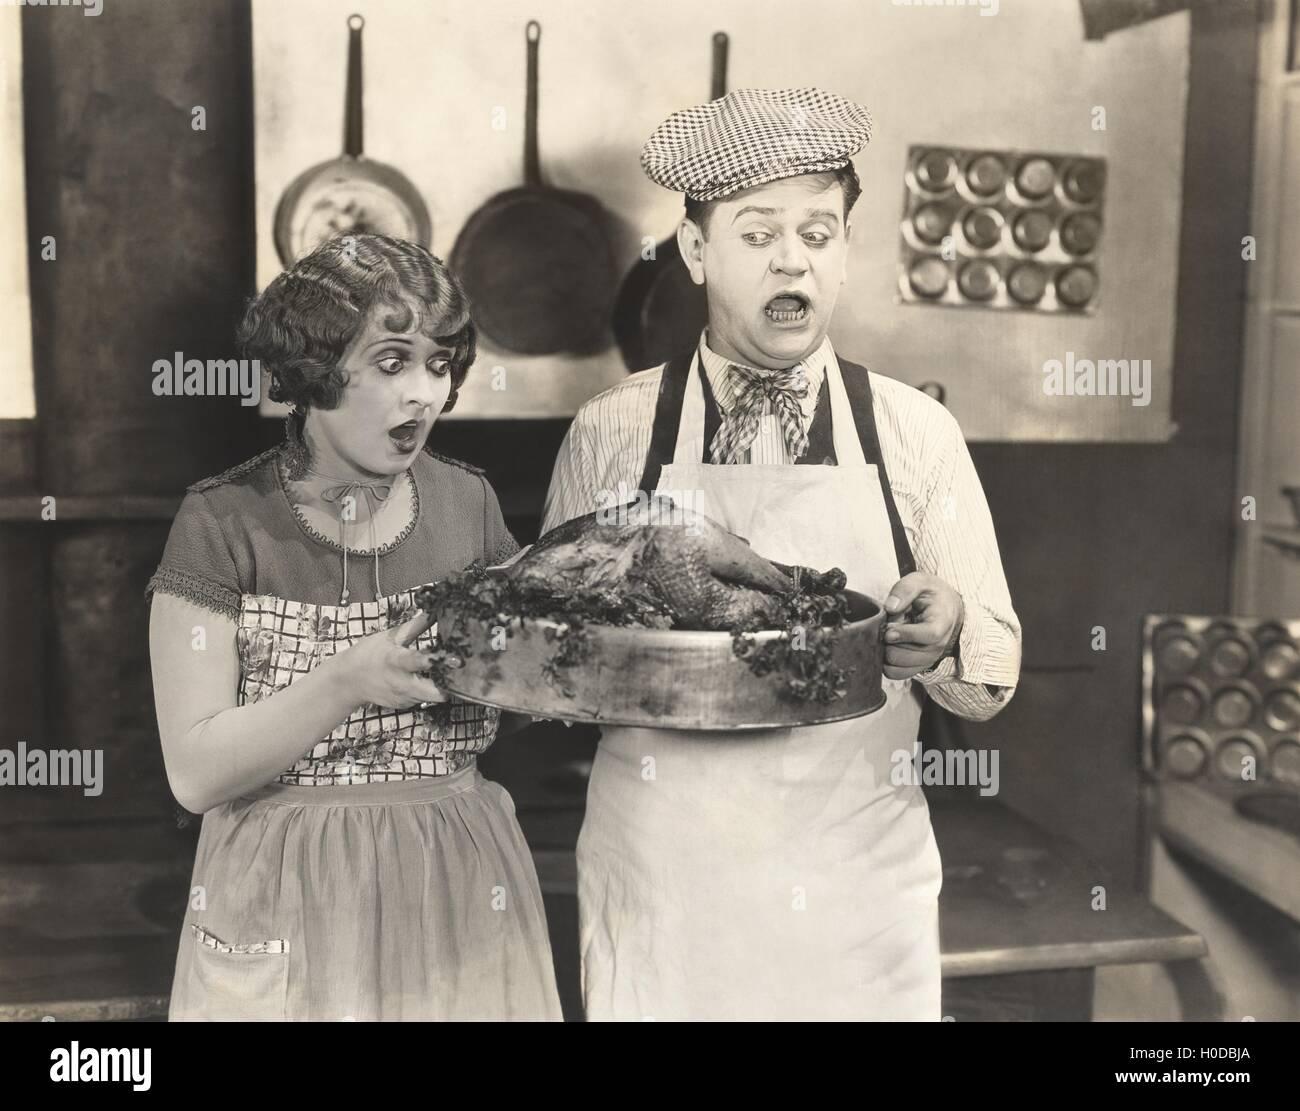 Thanksgiving dinner surprise - Stock Image